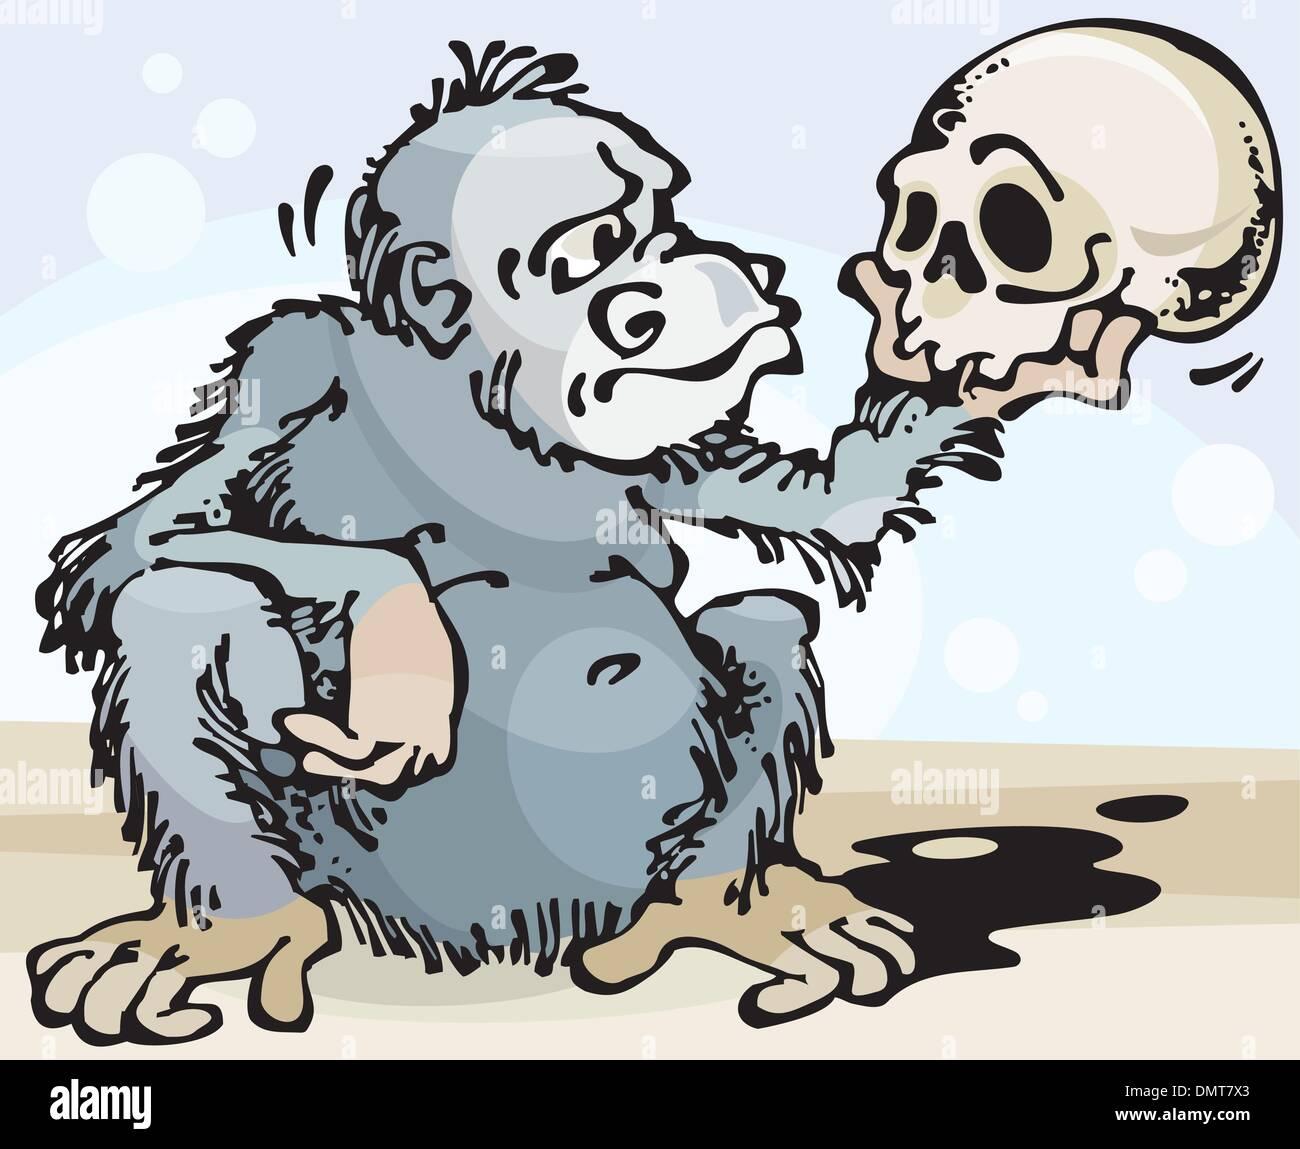 Monkey and Skull - Stock Vector